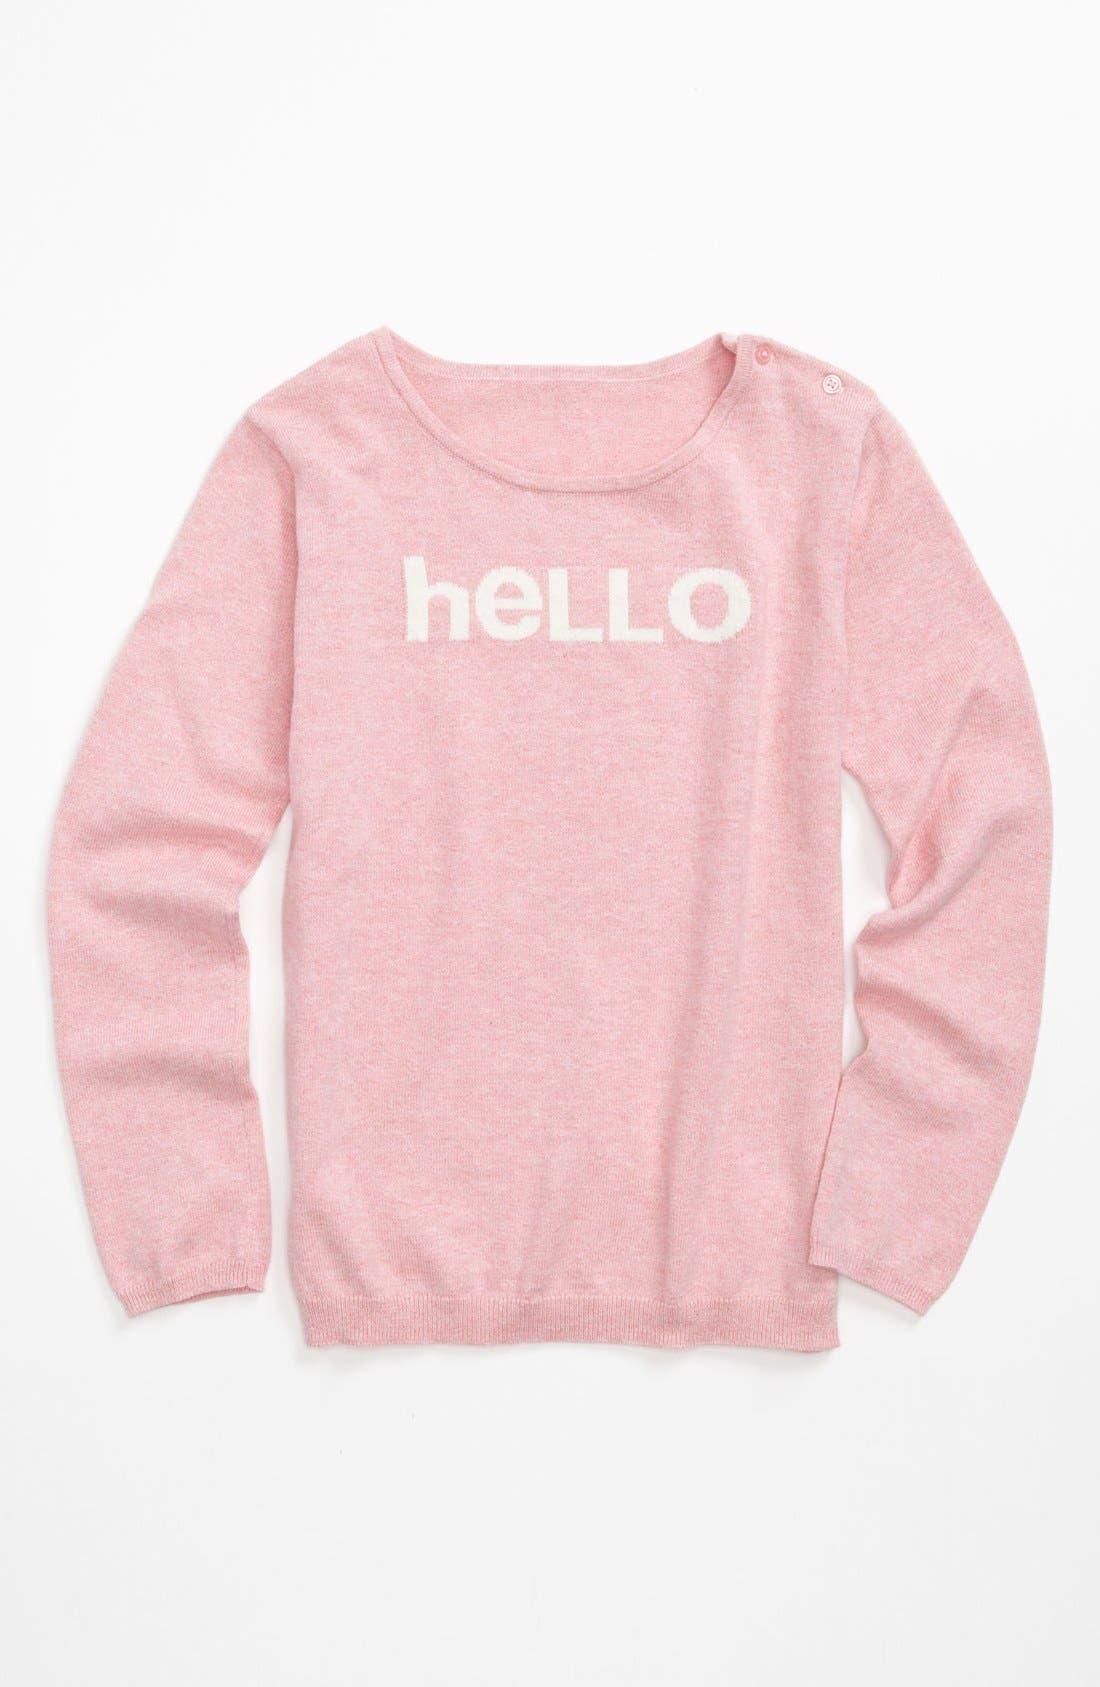 Alternate Image 1 Selected - Tucker + Tate 'Alexia' Sweater (Little Girls & Big Girls)